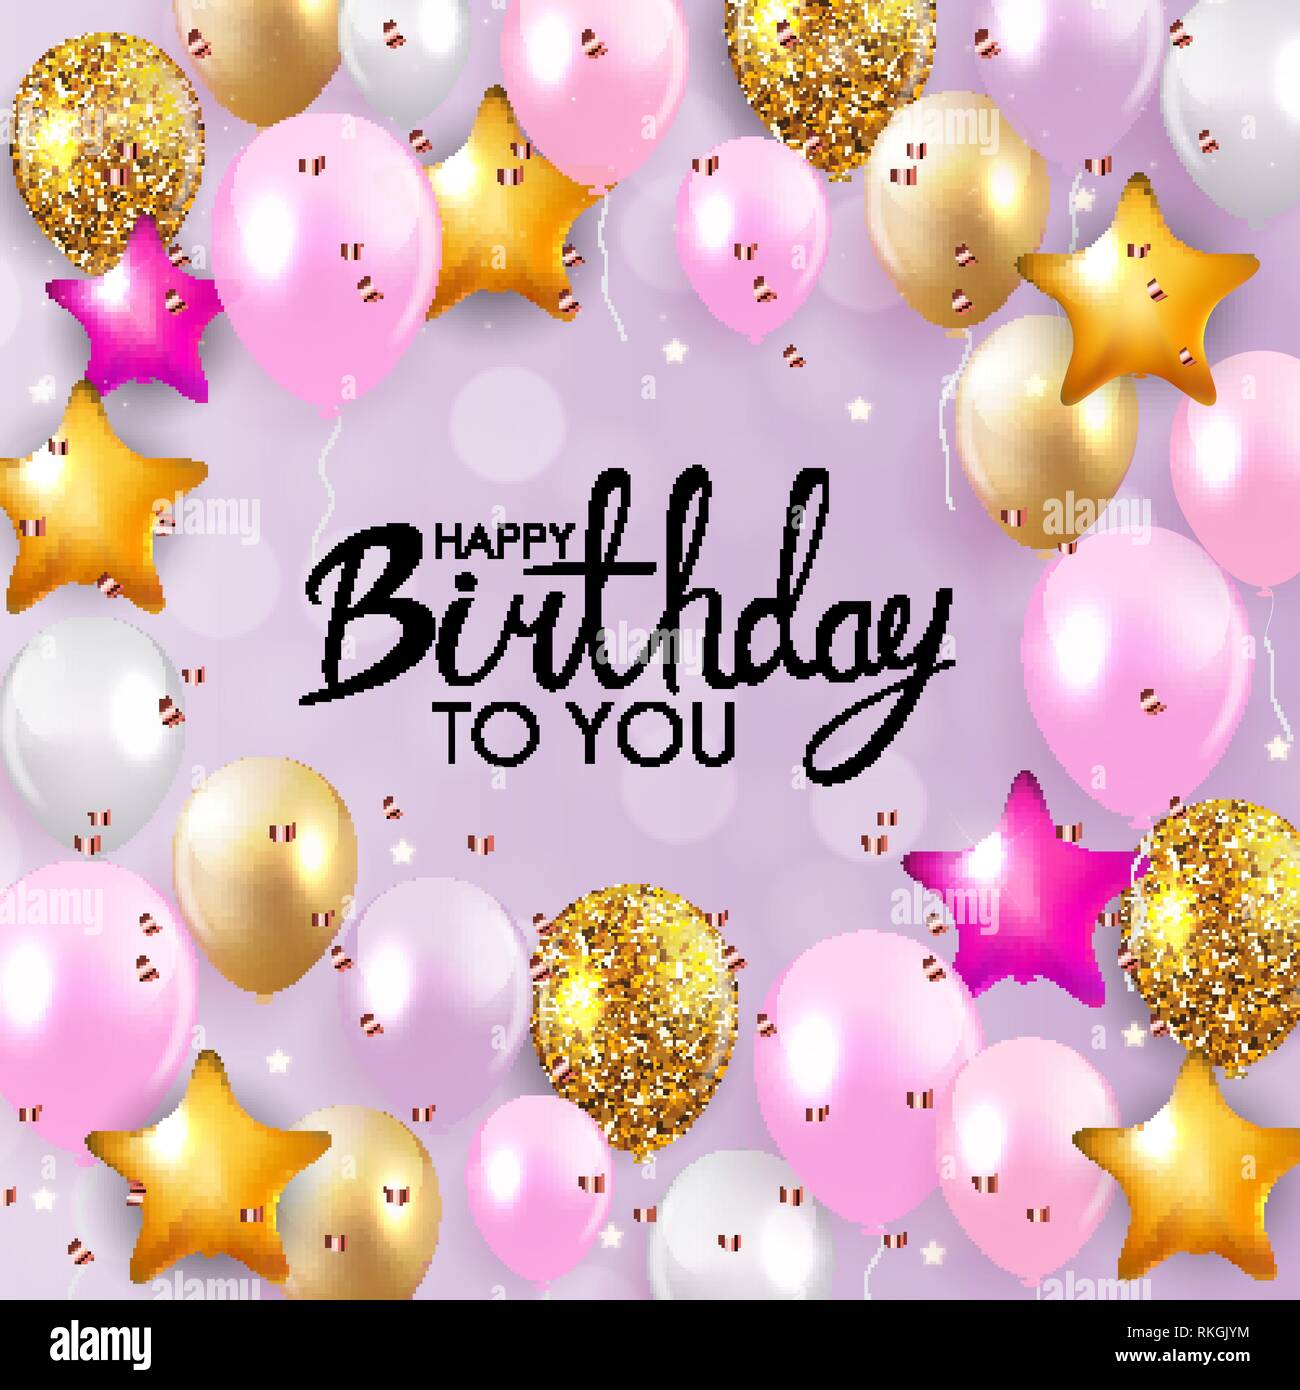 Glossy Happy Birthday Balloons Background Vector Illustration Eps10 Stock Vector Image Art Alamy